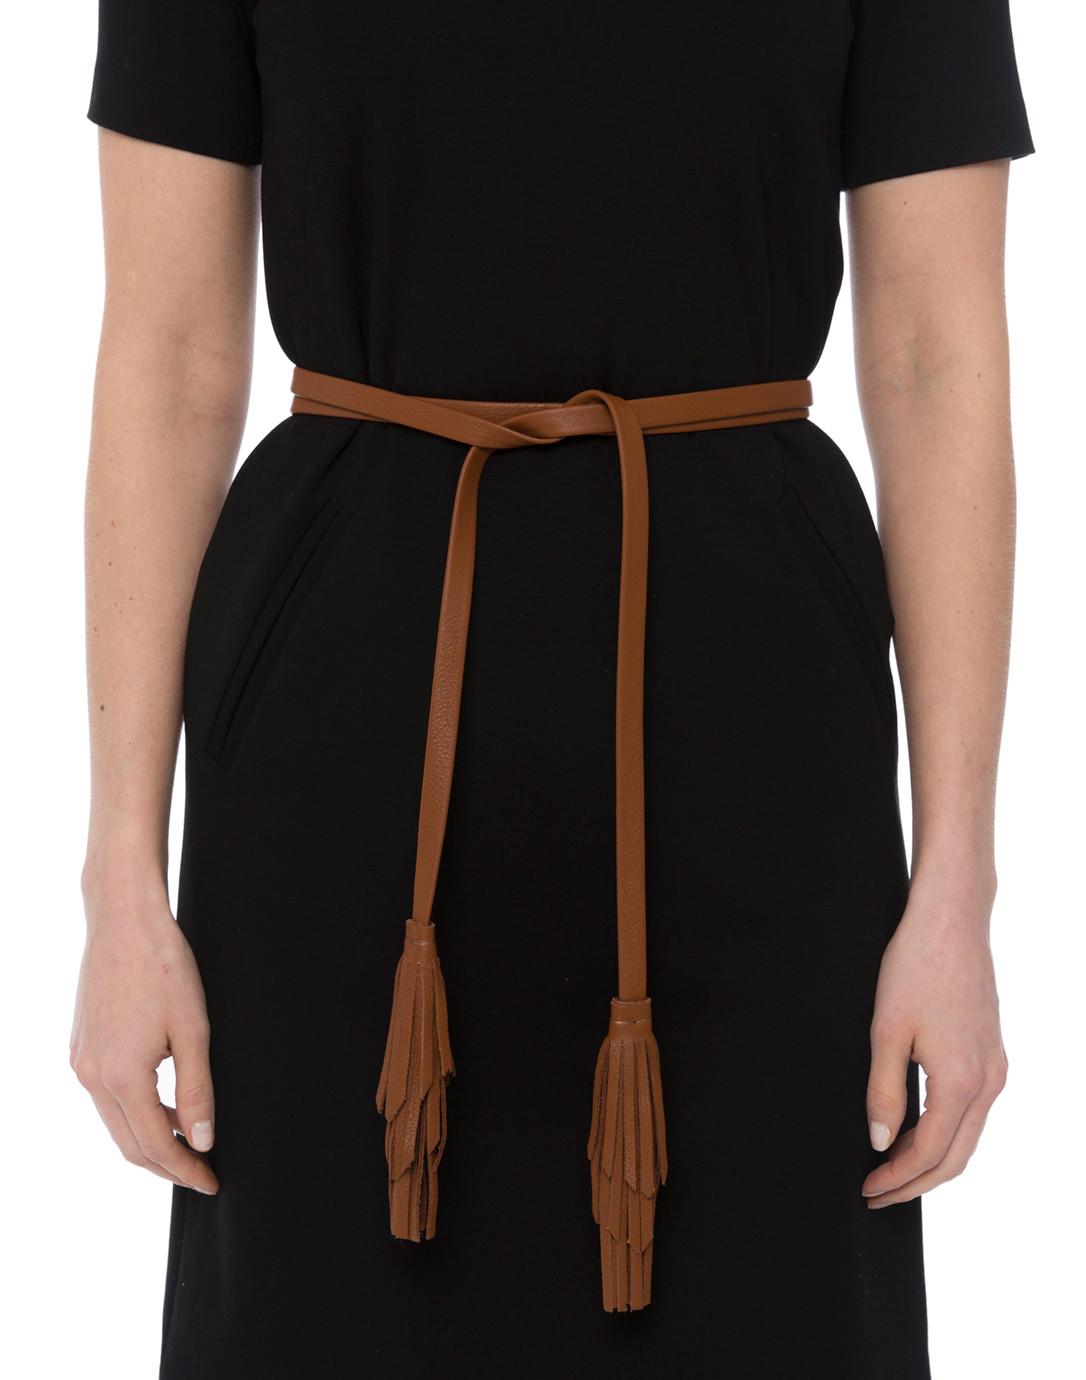 wrapbelt leather belt Belt